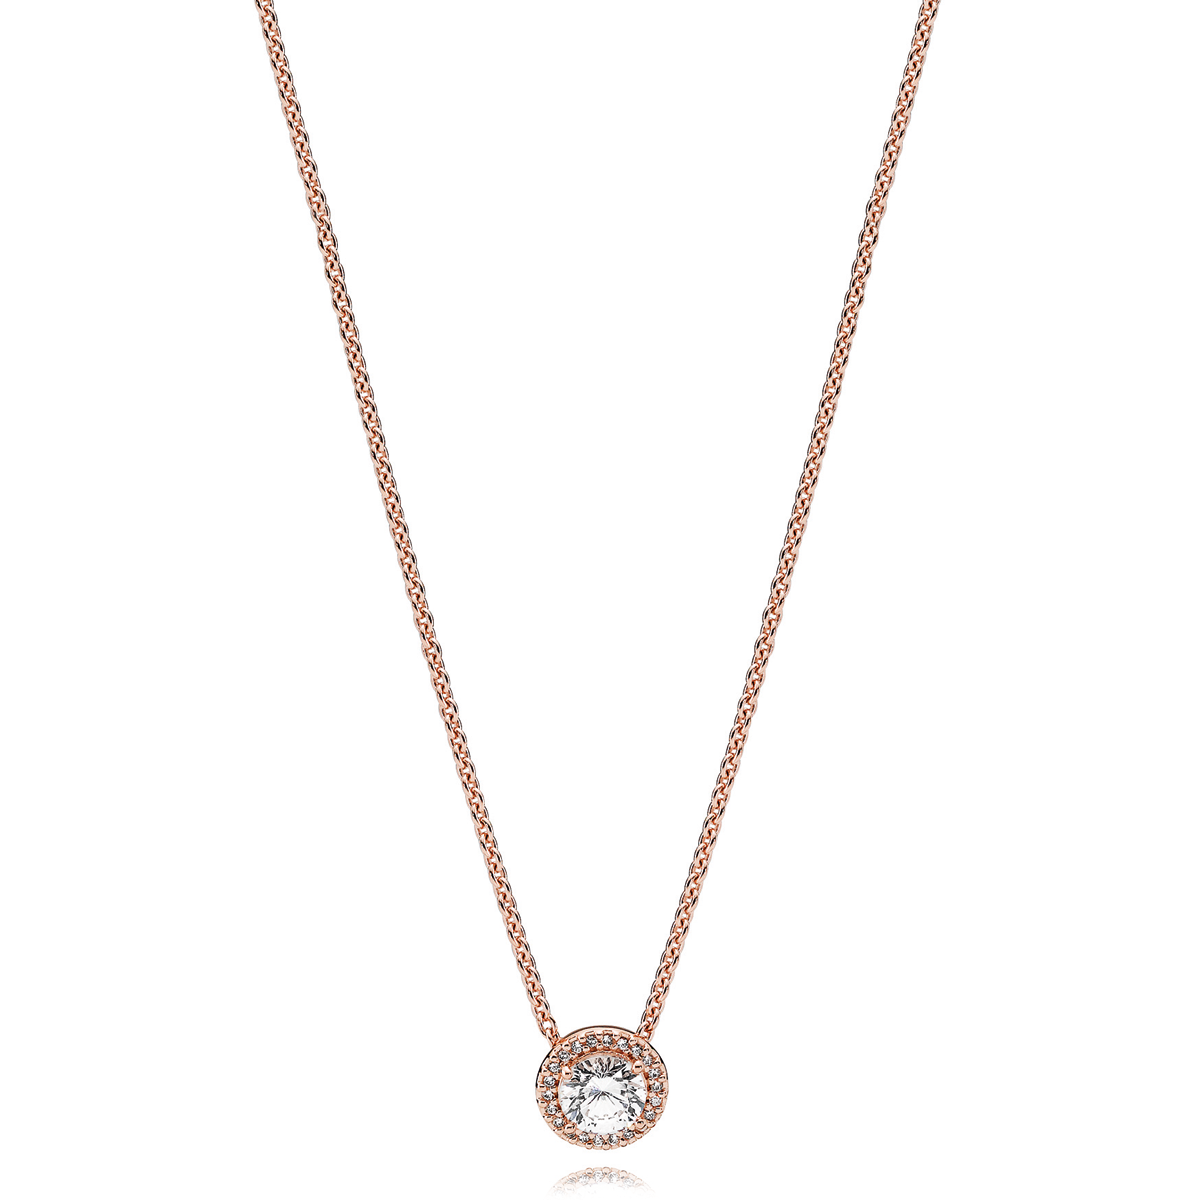 Pandora necklaces pancharmbracelets pandora rose cz classic elegance necklace detail pandora rose cz classic elegance necklace aloadofball Gallery